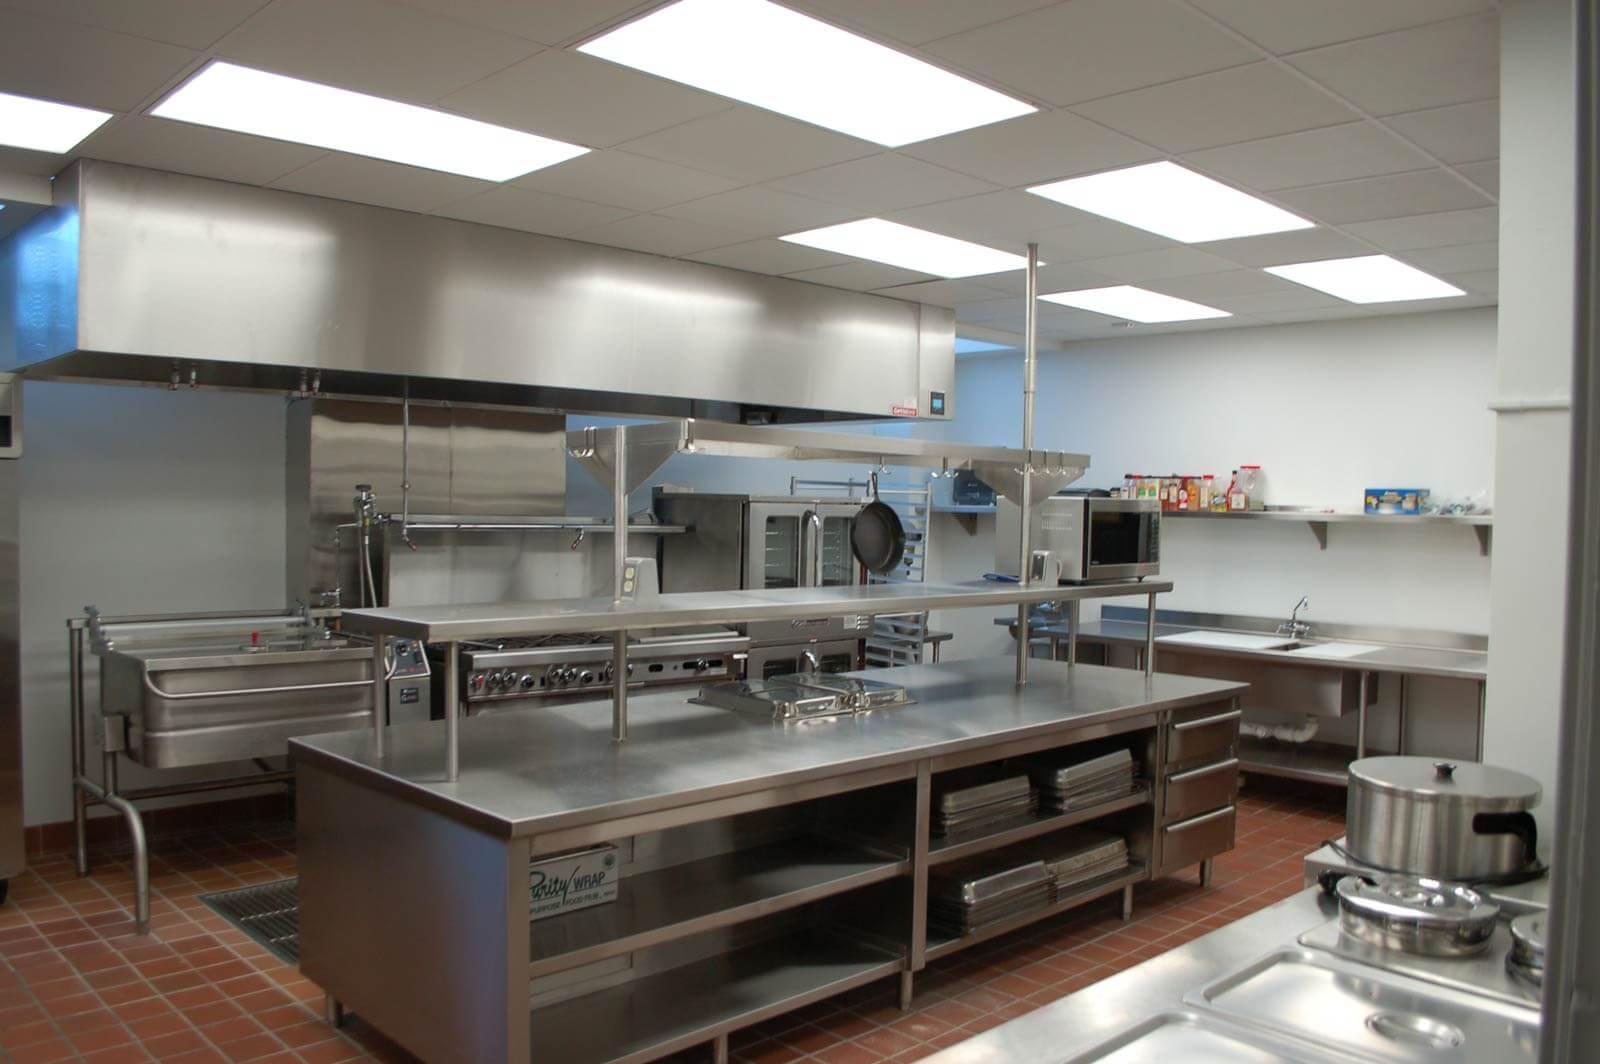 Church Kitchen Design Projects Food Service C Amp T Design